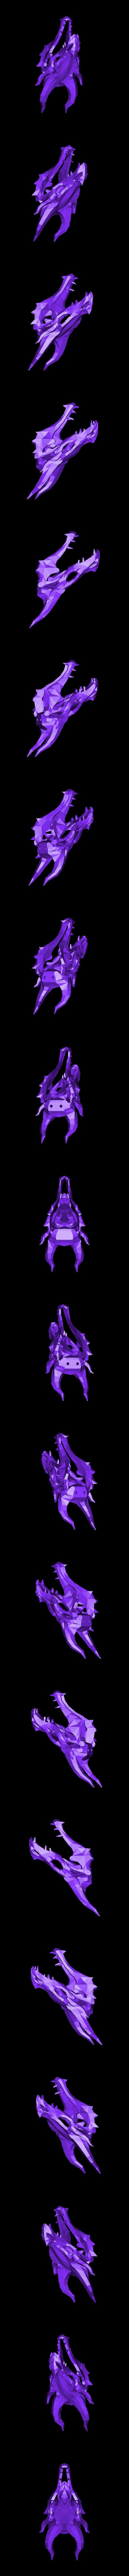 skull.stl Download free STL file Skyrim skull Dragon wall Trophy • 3D printable model, raffosan